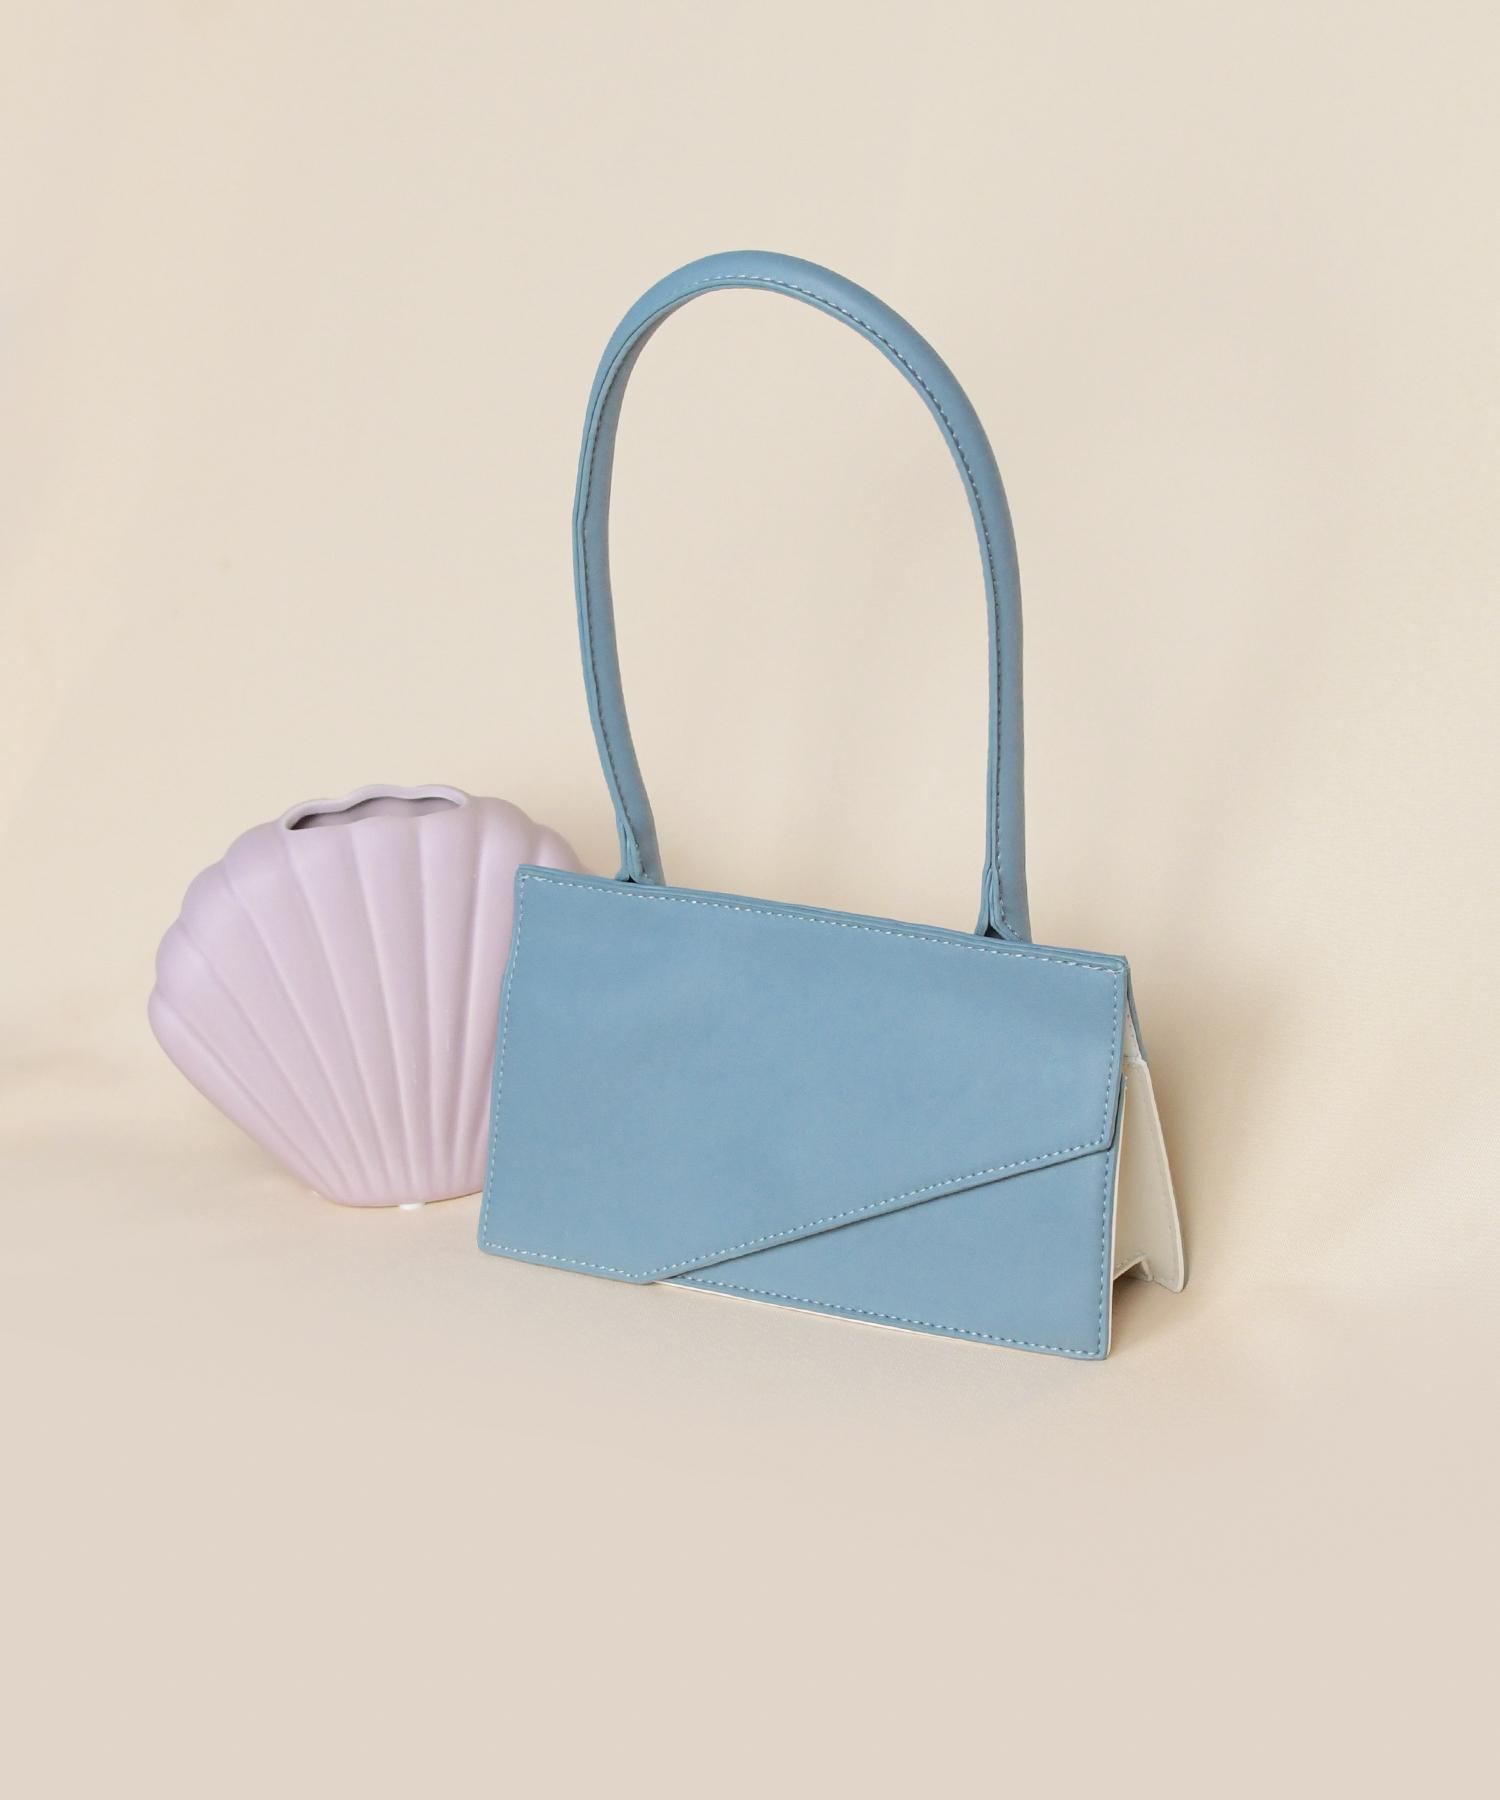 genoa-rectangular-bag-mist-blue-1